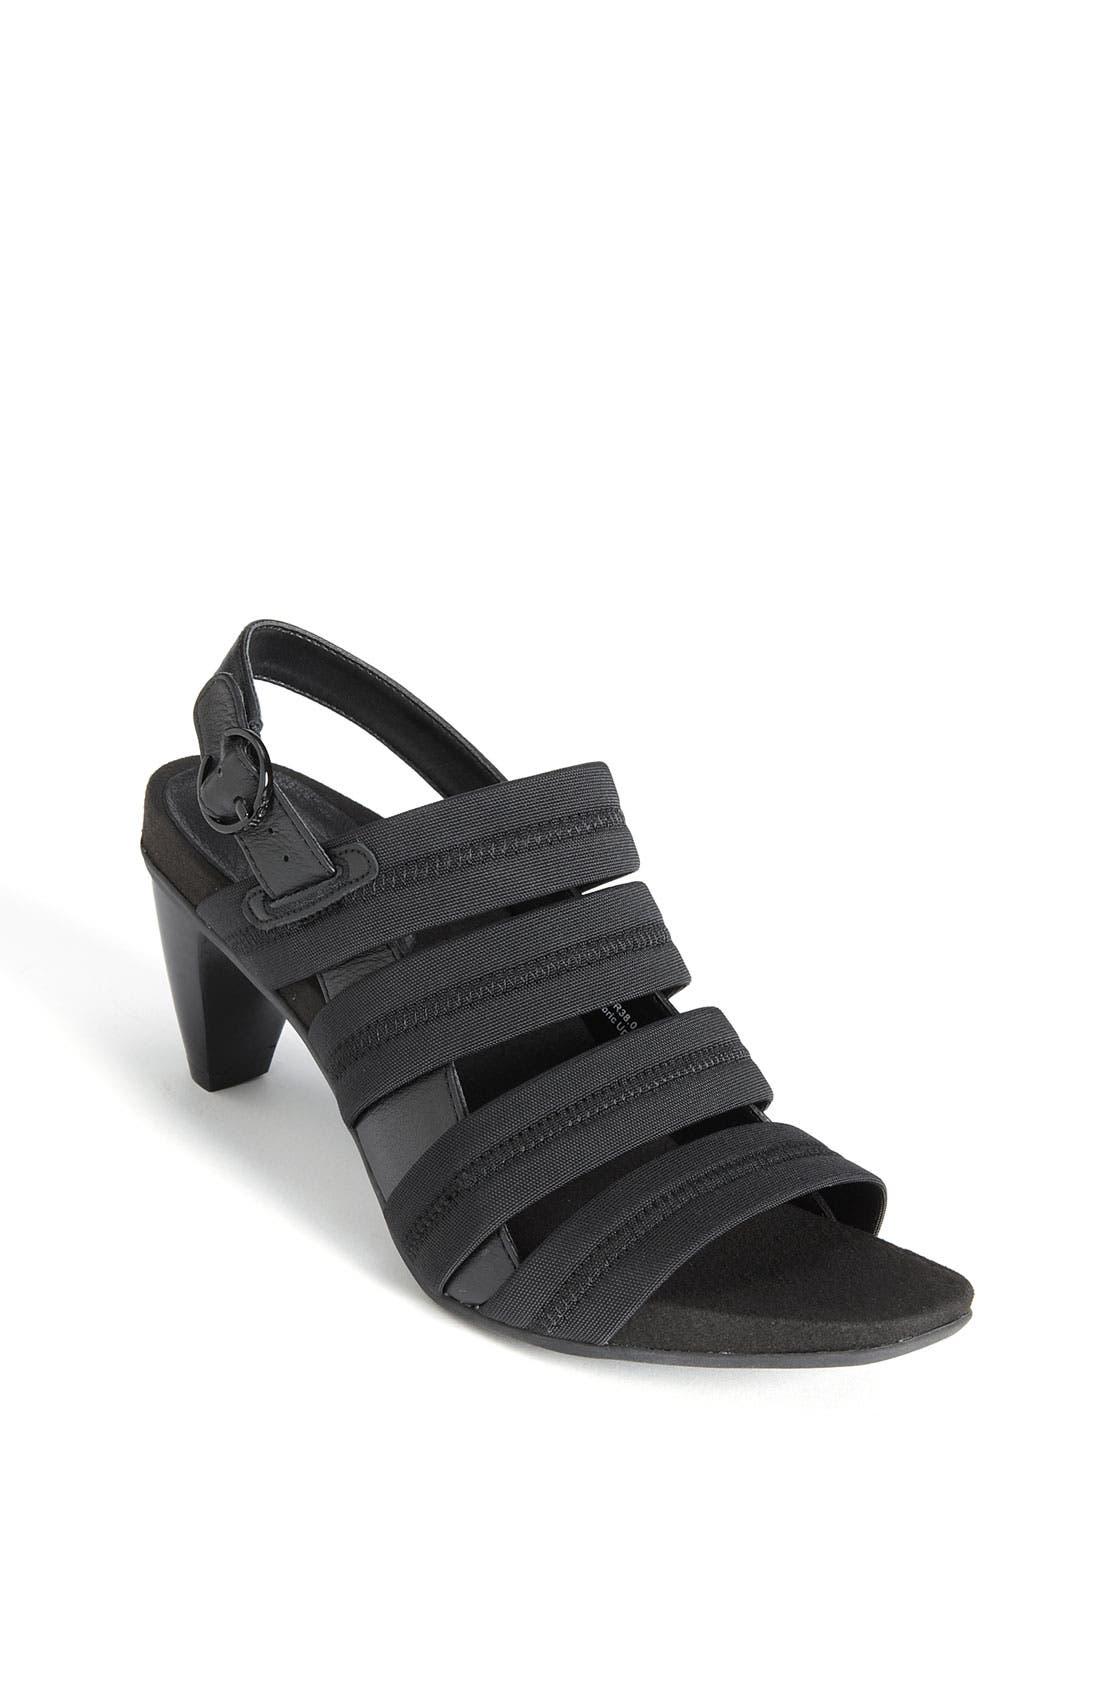 Main Image - Aetrex 'Veronica' Sandal